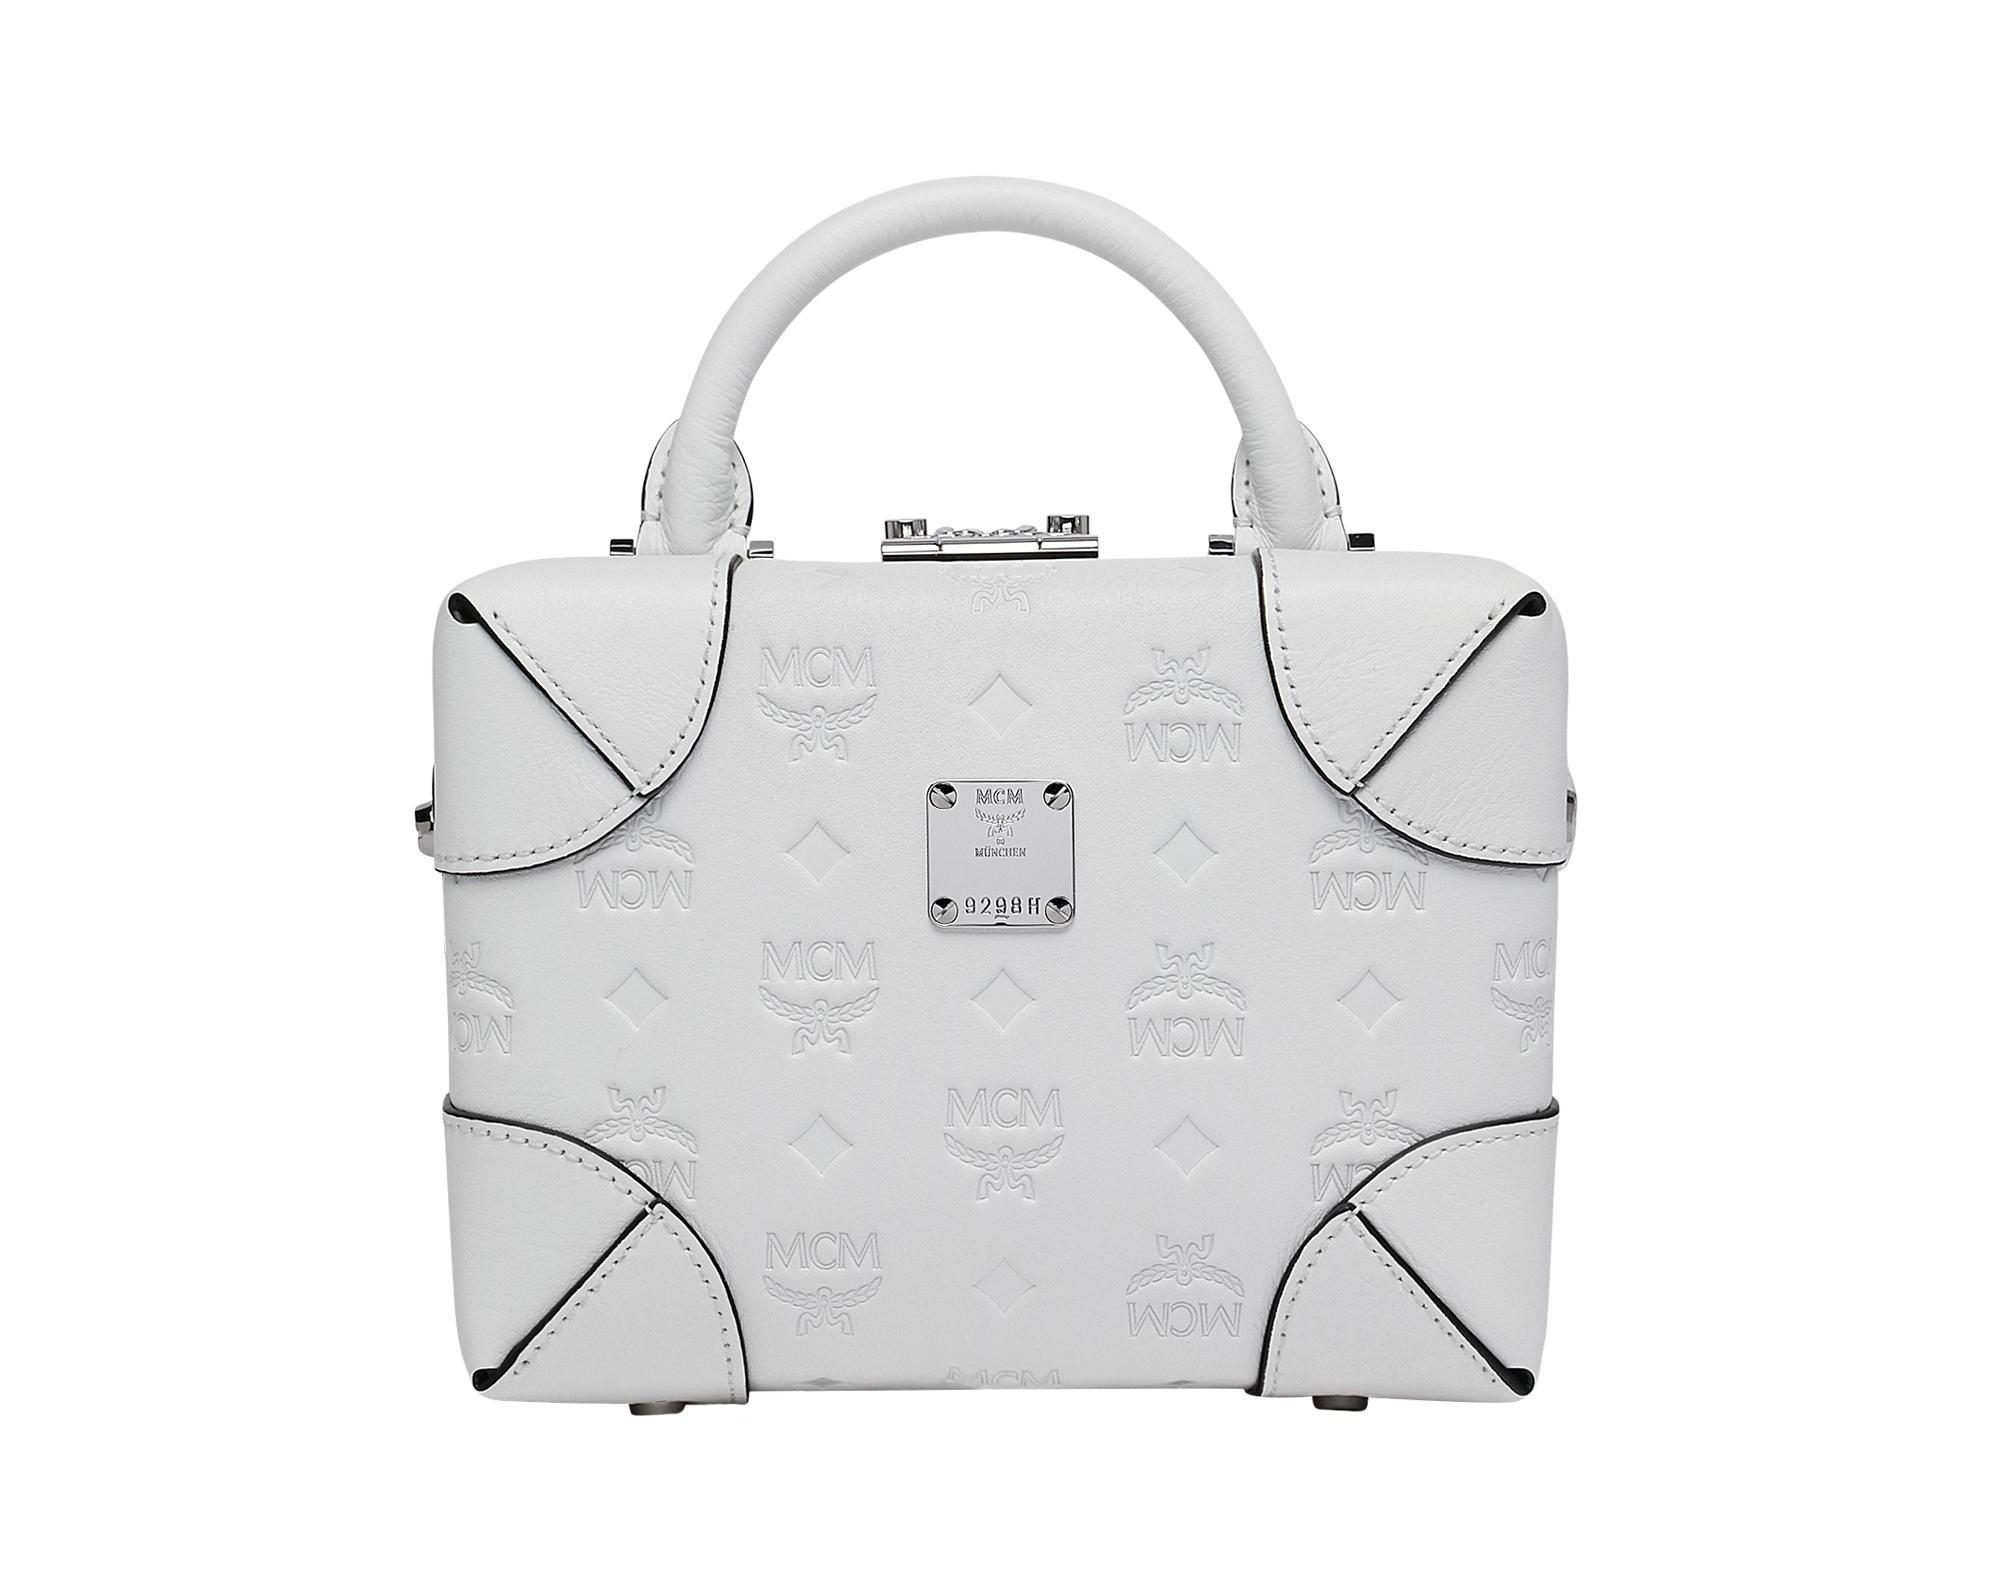 MCM munich bag purse luxury white leather